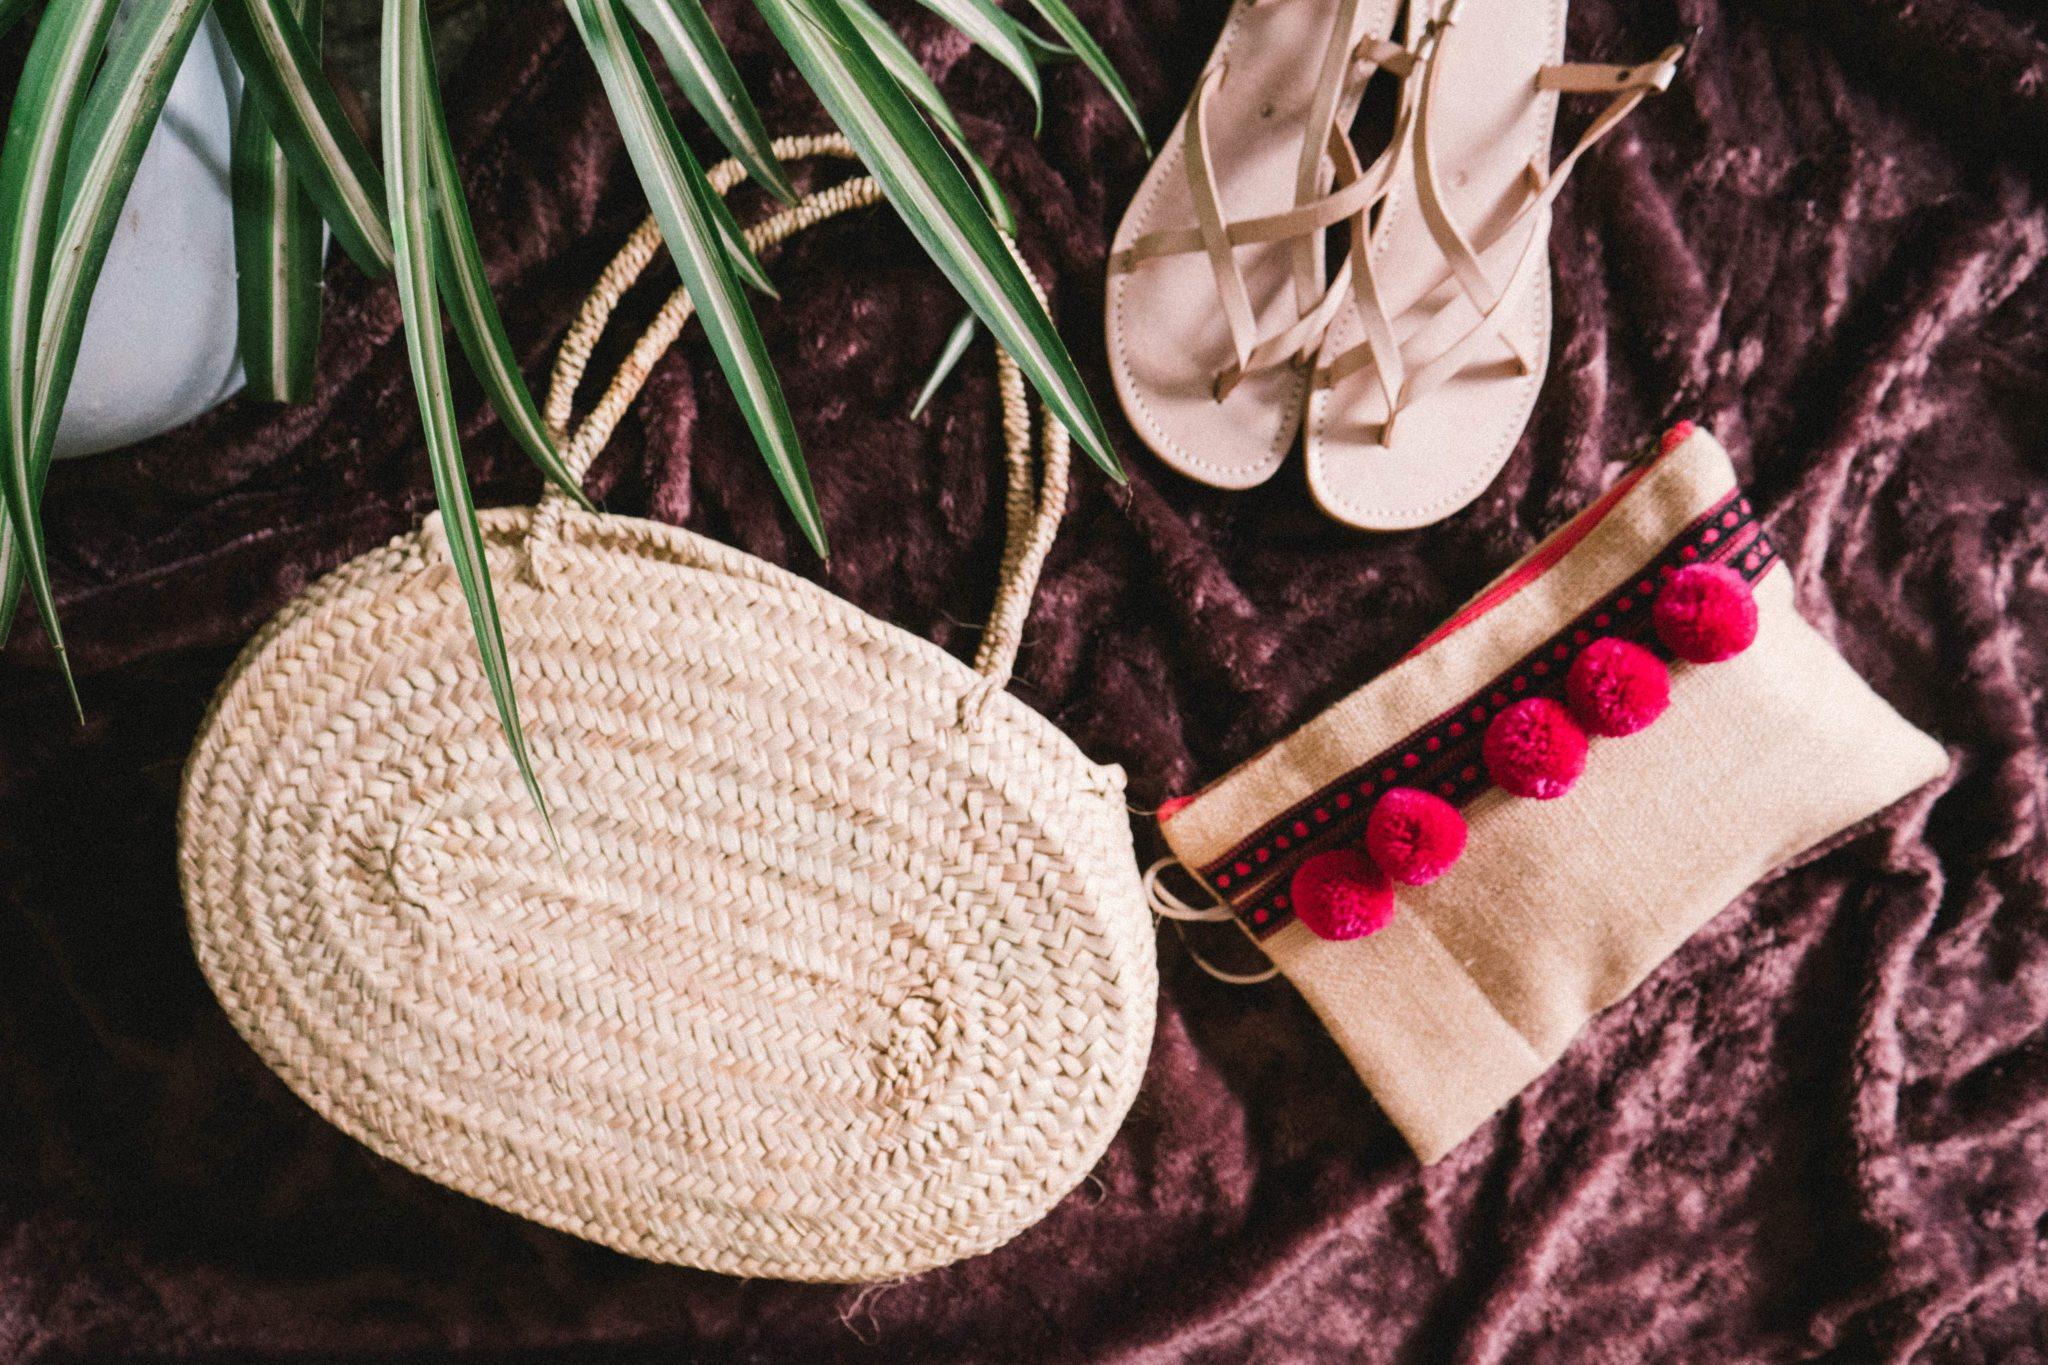 Medina haul: bohemian chic summer staples